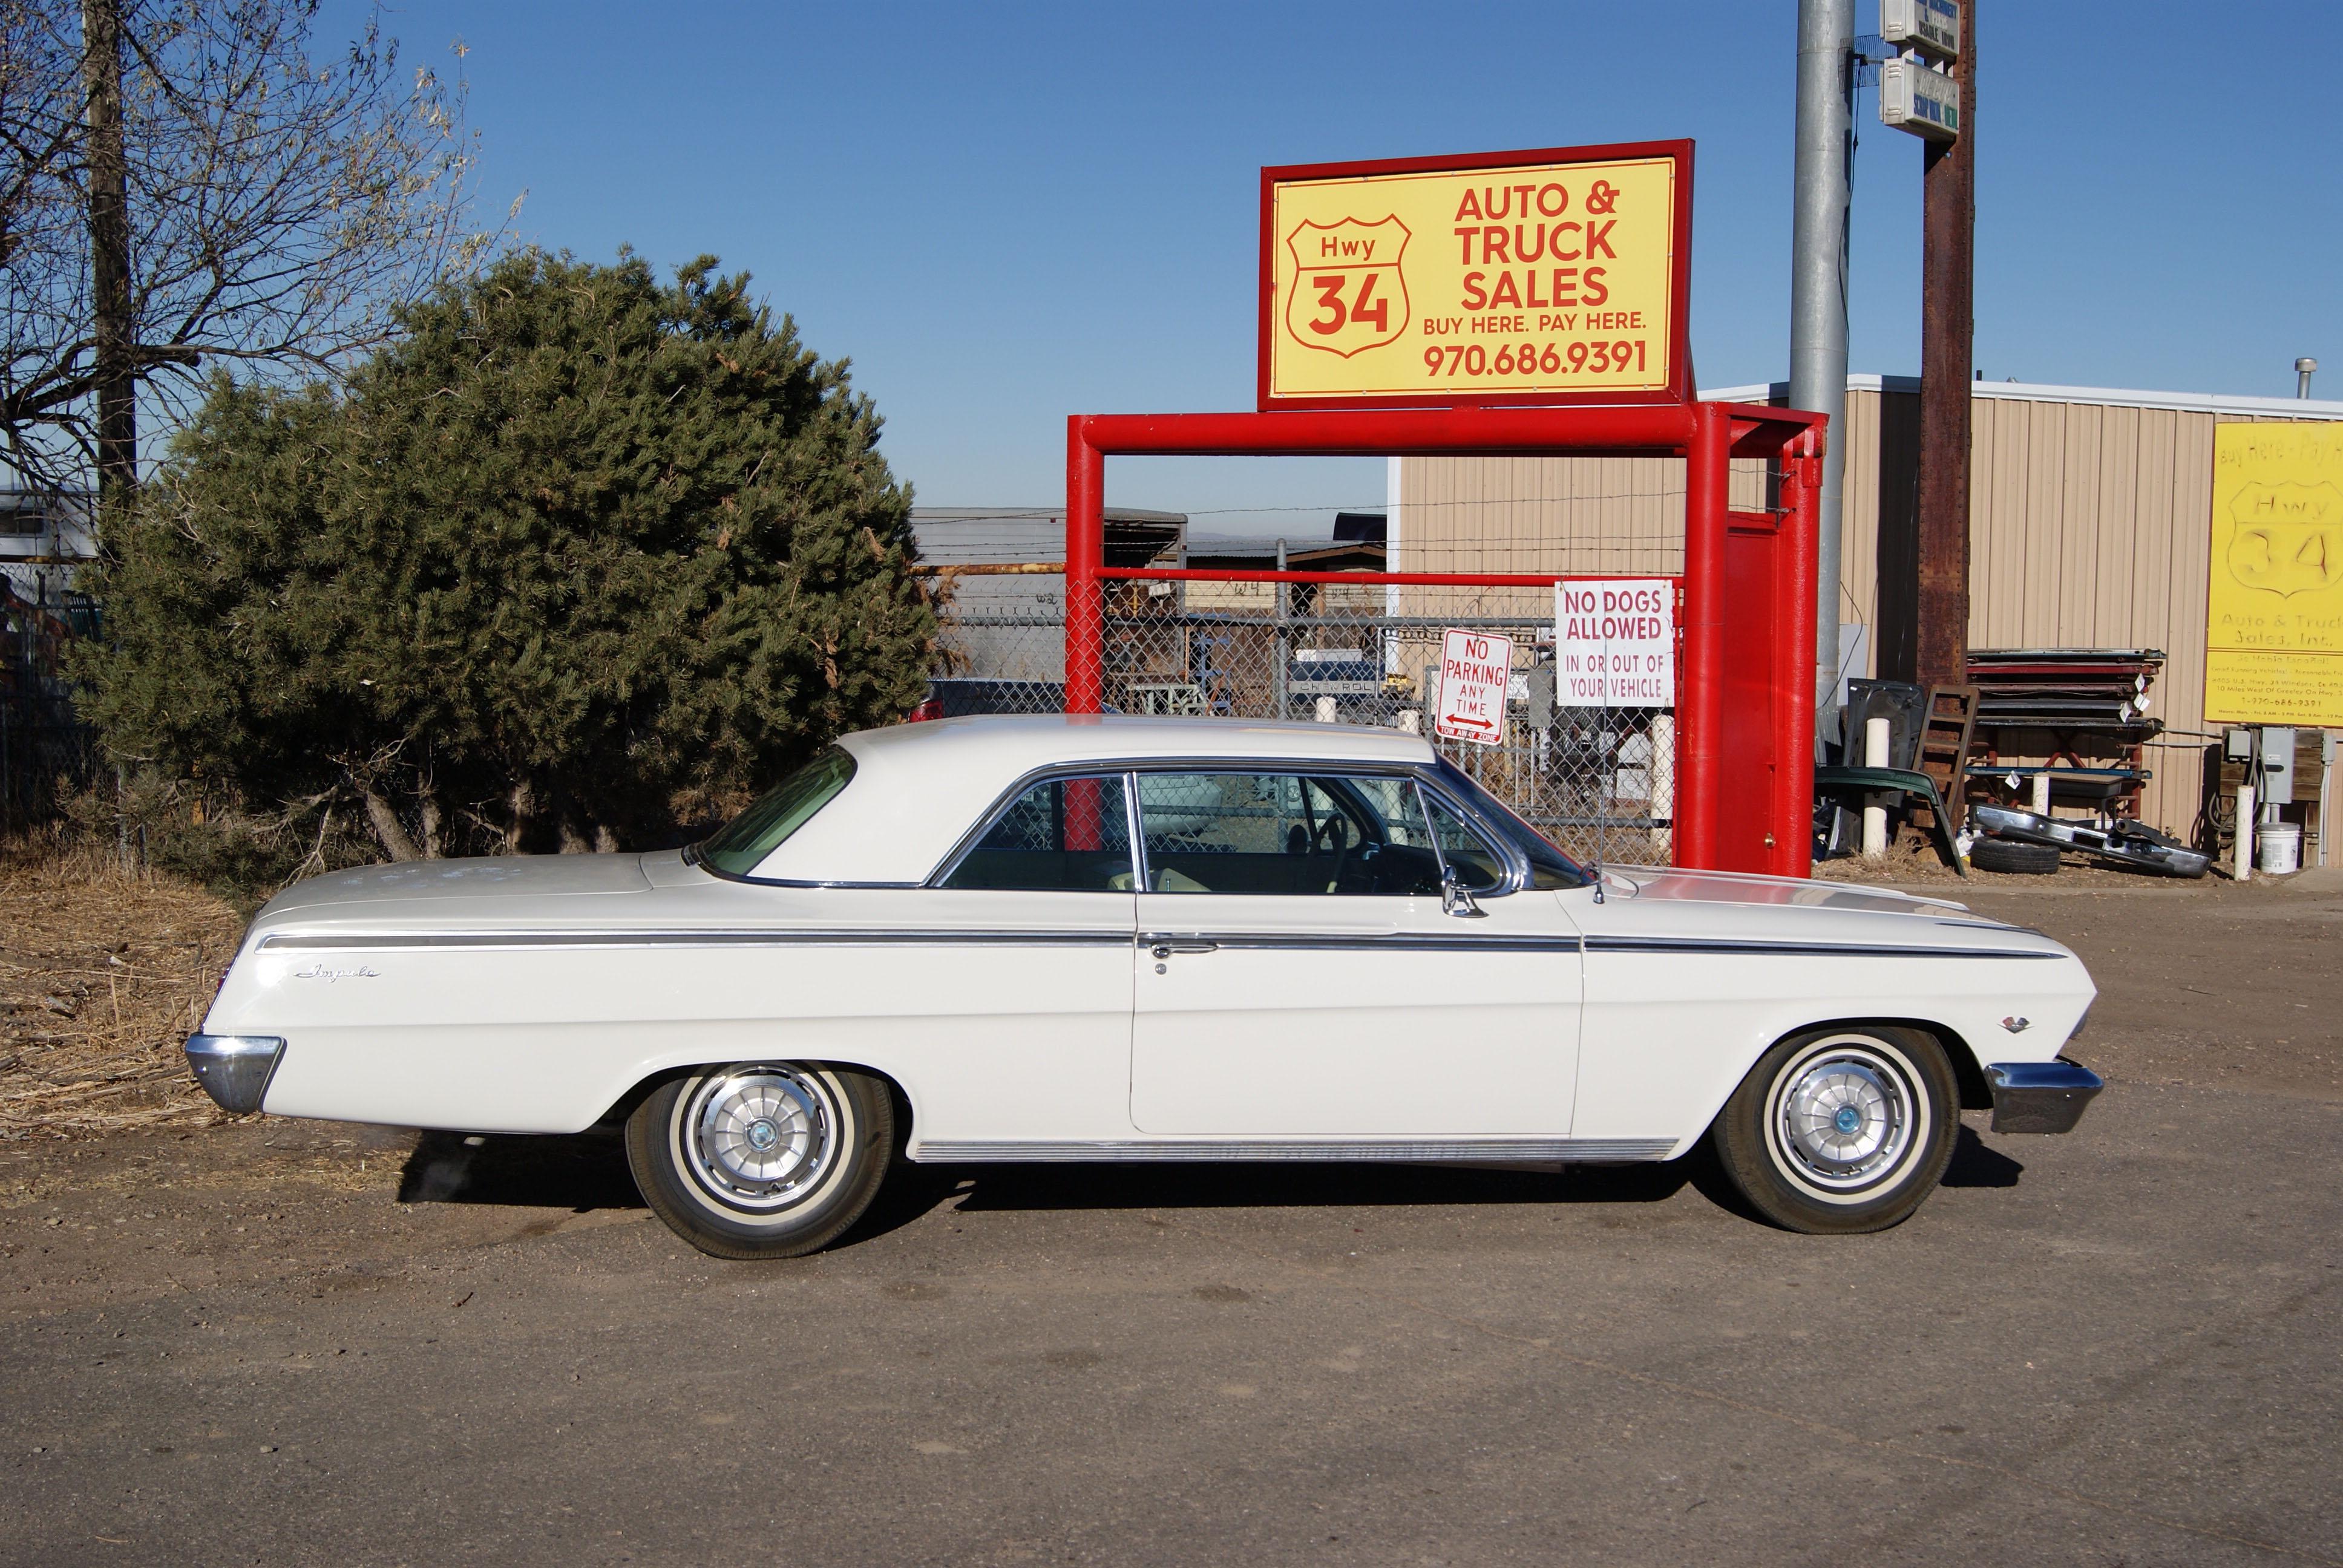 Restored Vehicles - Windsor, CO - Martin Supply Inc: Highway 34 Auto ...